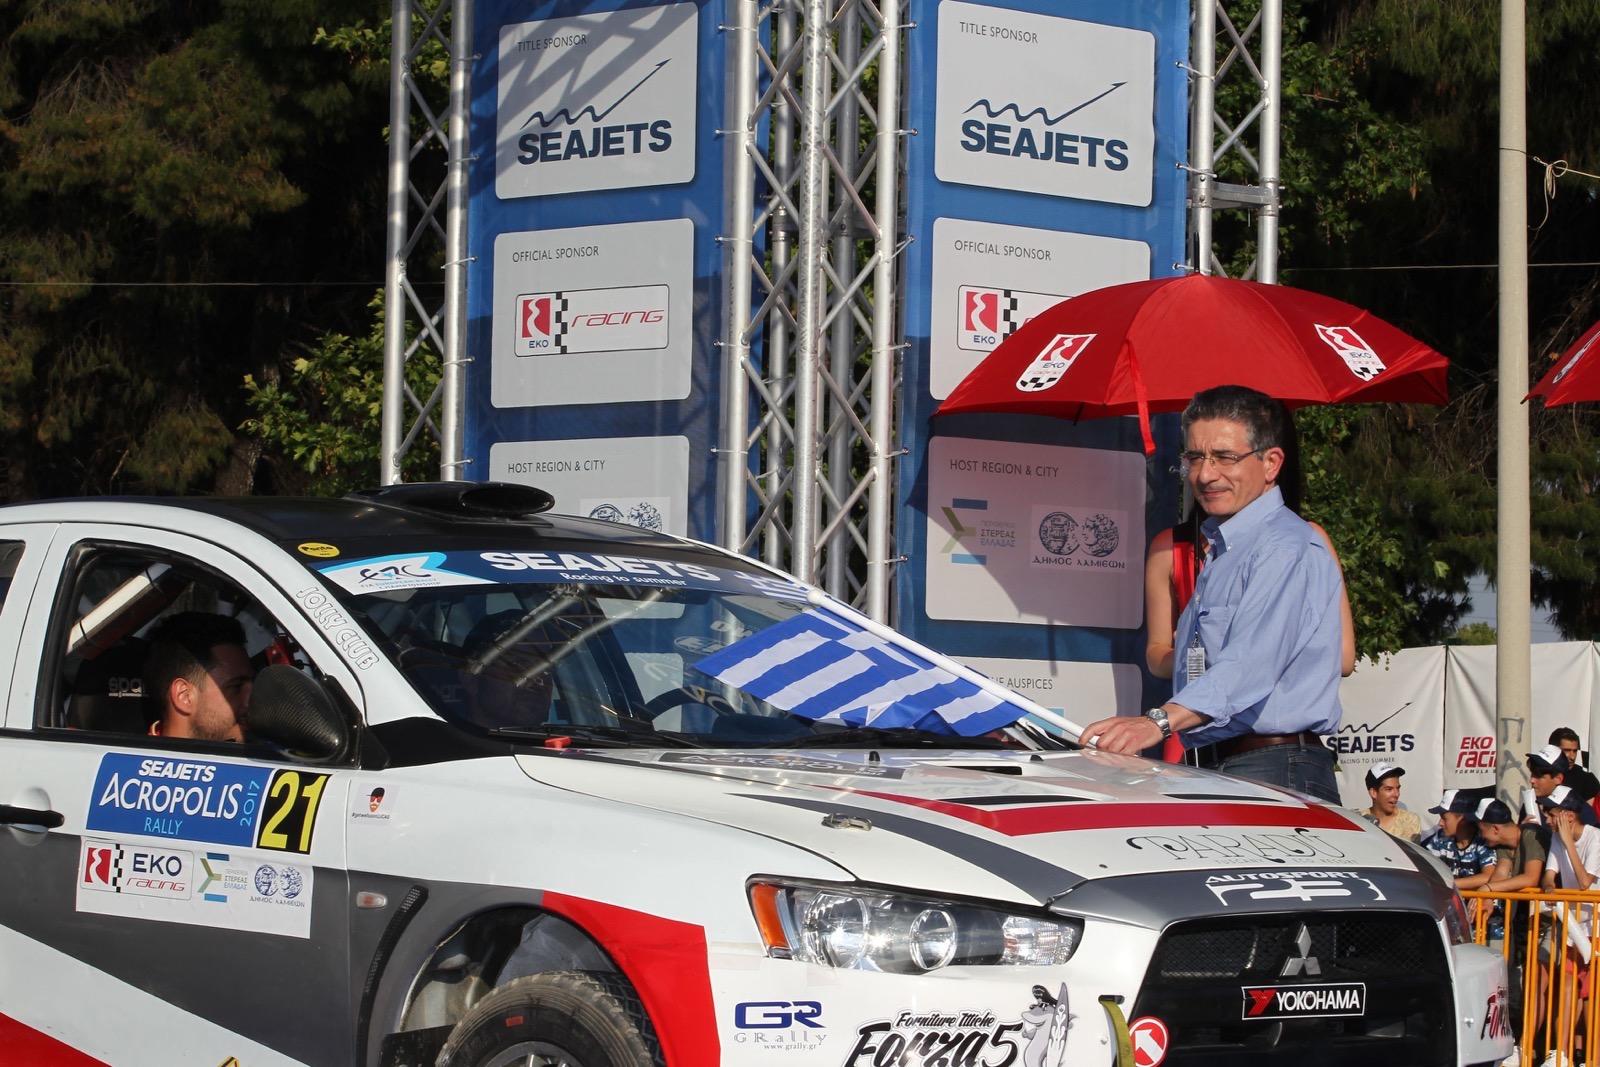 Rally_Acropolis_2017_Ceremonial_Start_45